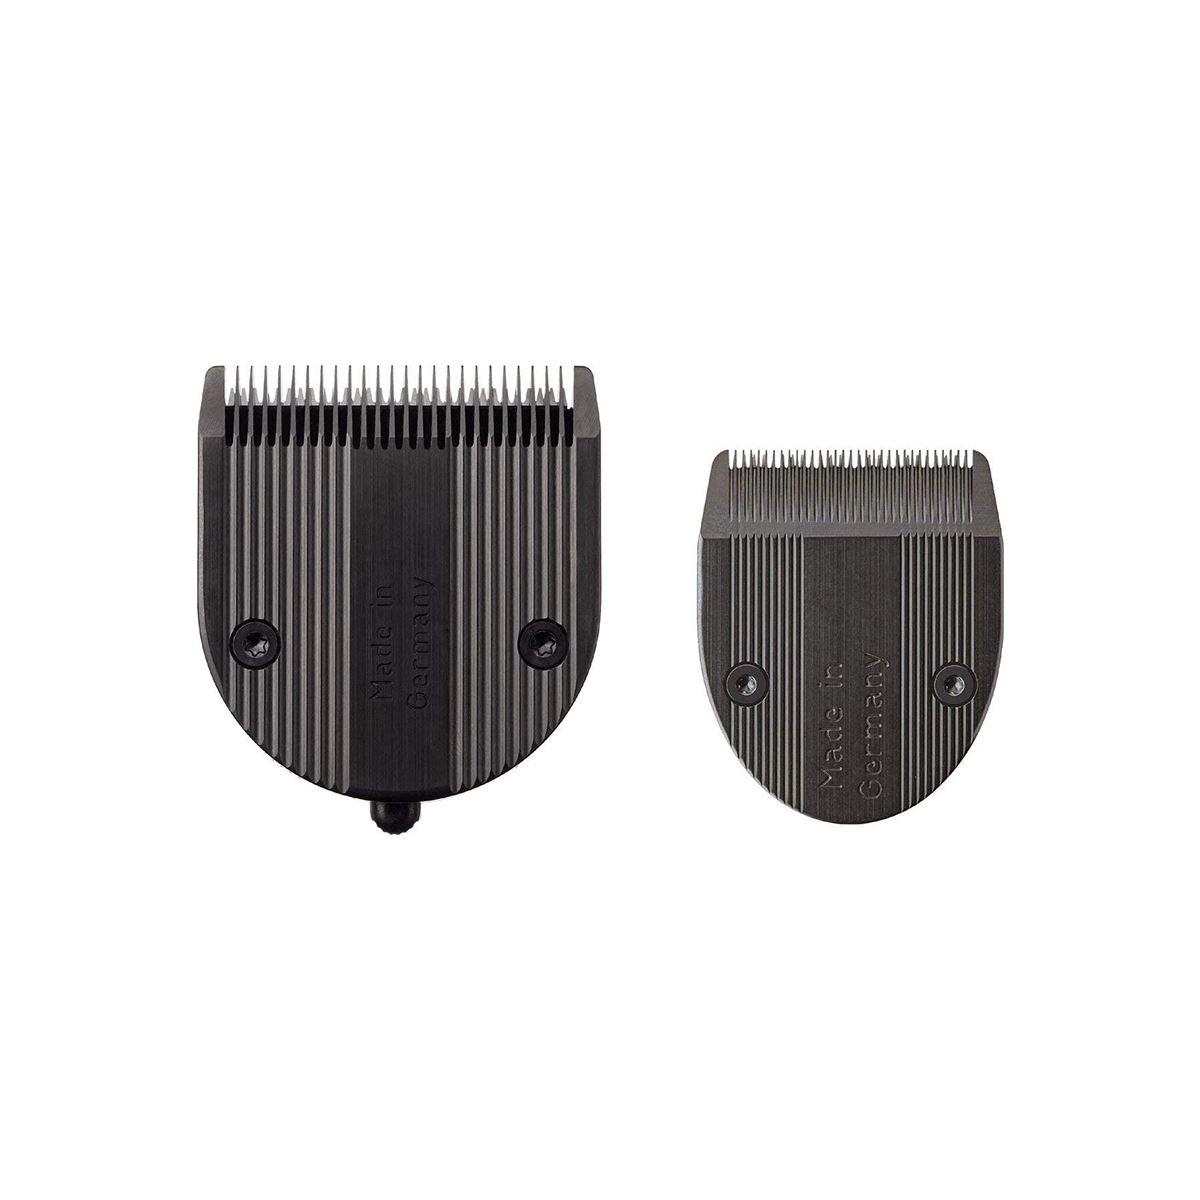 Moser ChromSytle Pro & ChroMini Pro 1871-0079 Tıraş Makinesi